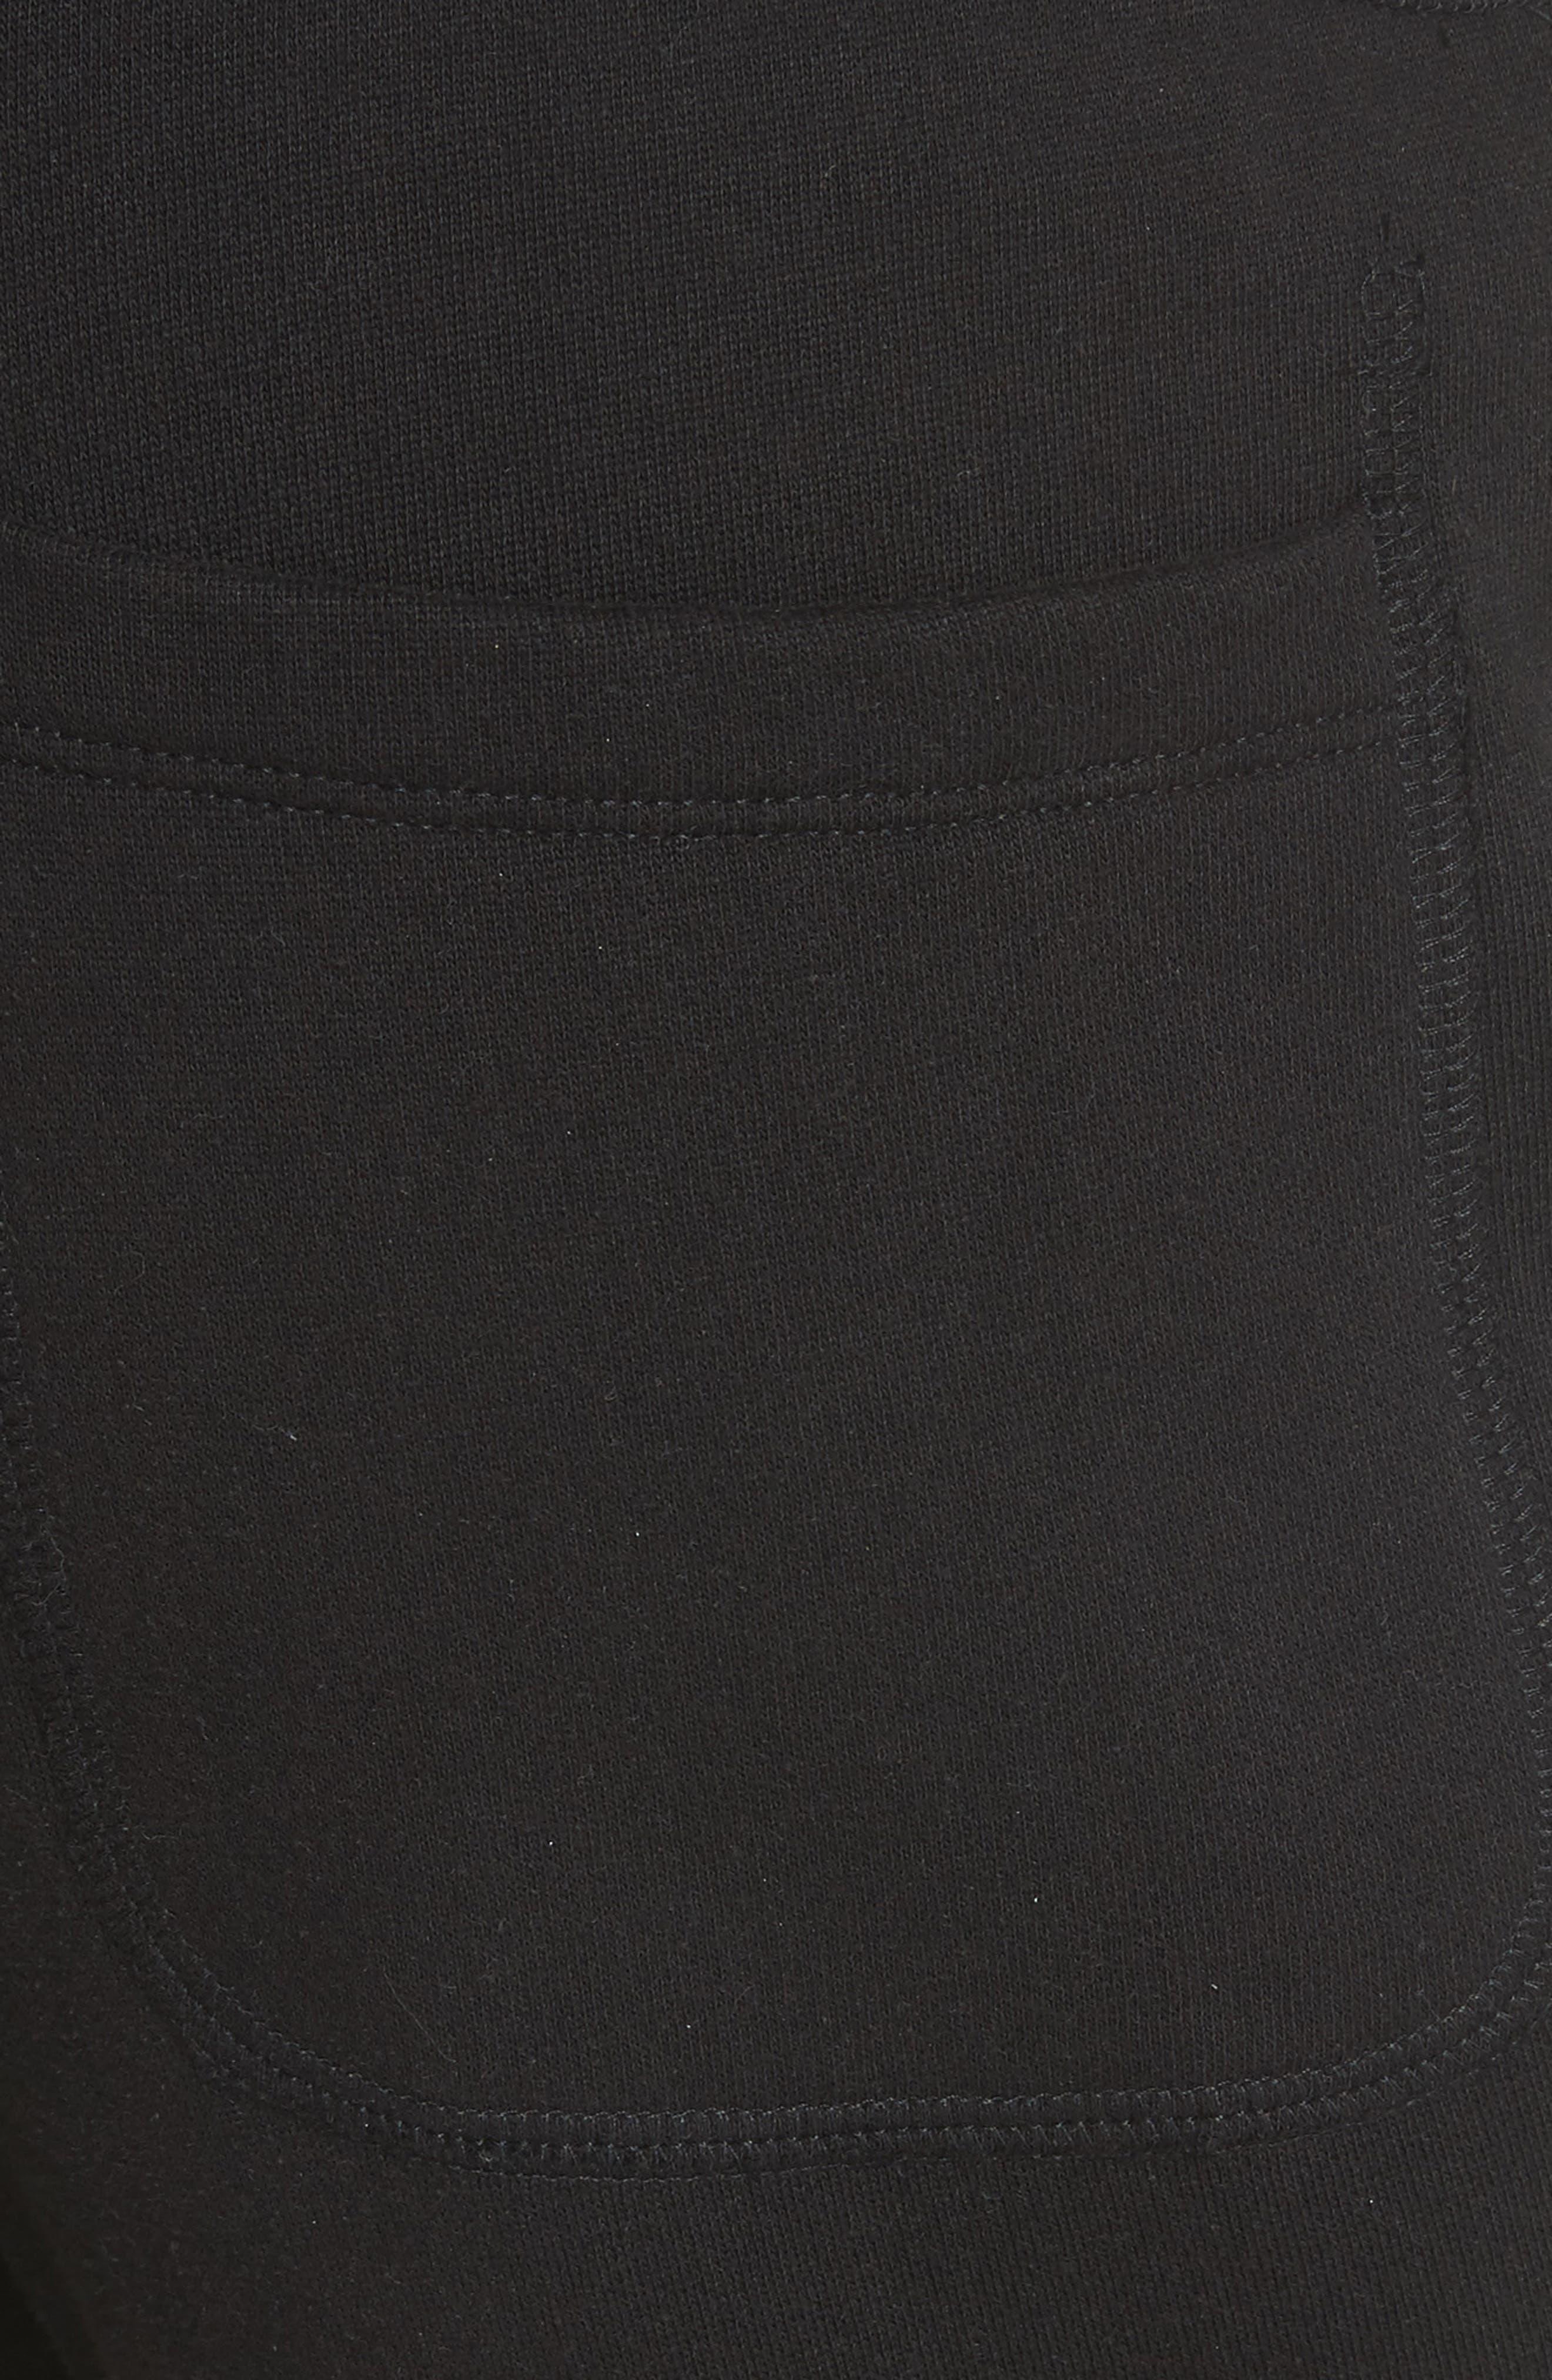 Cotton Blend Jogger Pants,                             Alternate thumbnail 5, color,                             Black